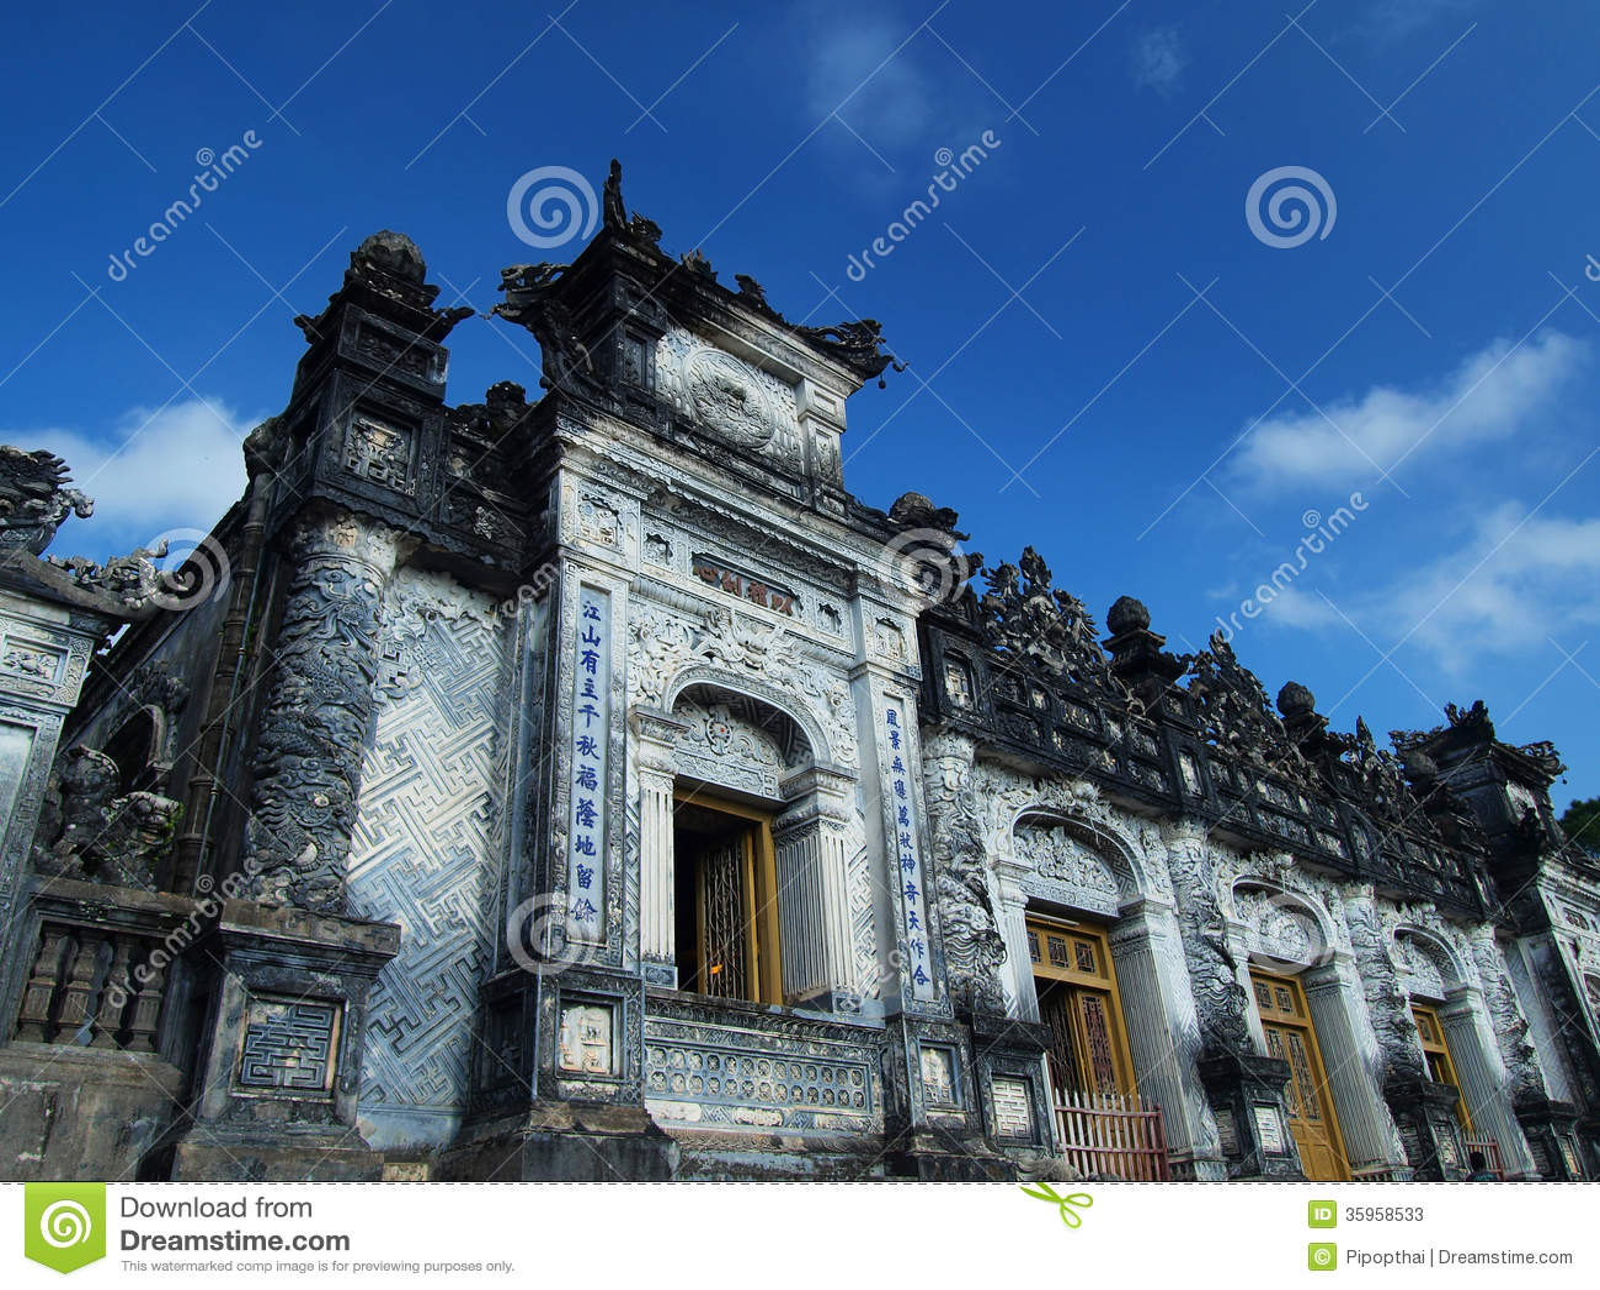 Tumba de Khai Dinh, tonalidad, Vietnam. Sitio del patrimonio mundial de la UNESCO.